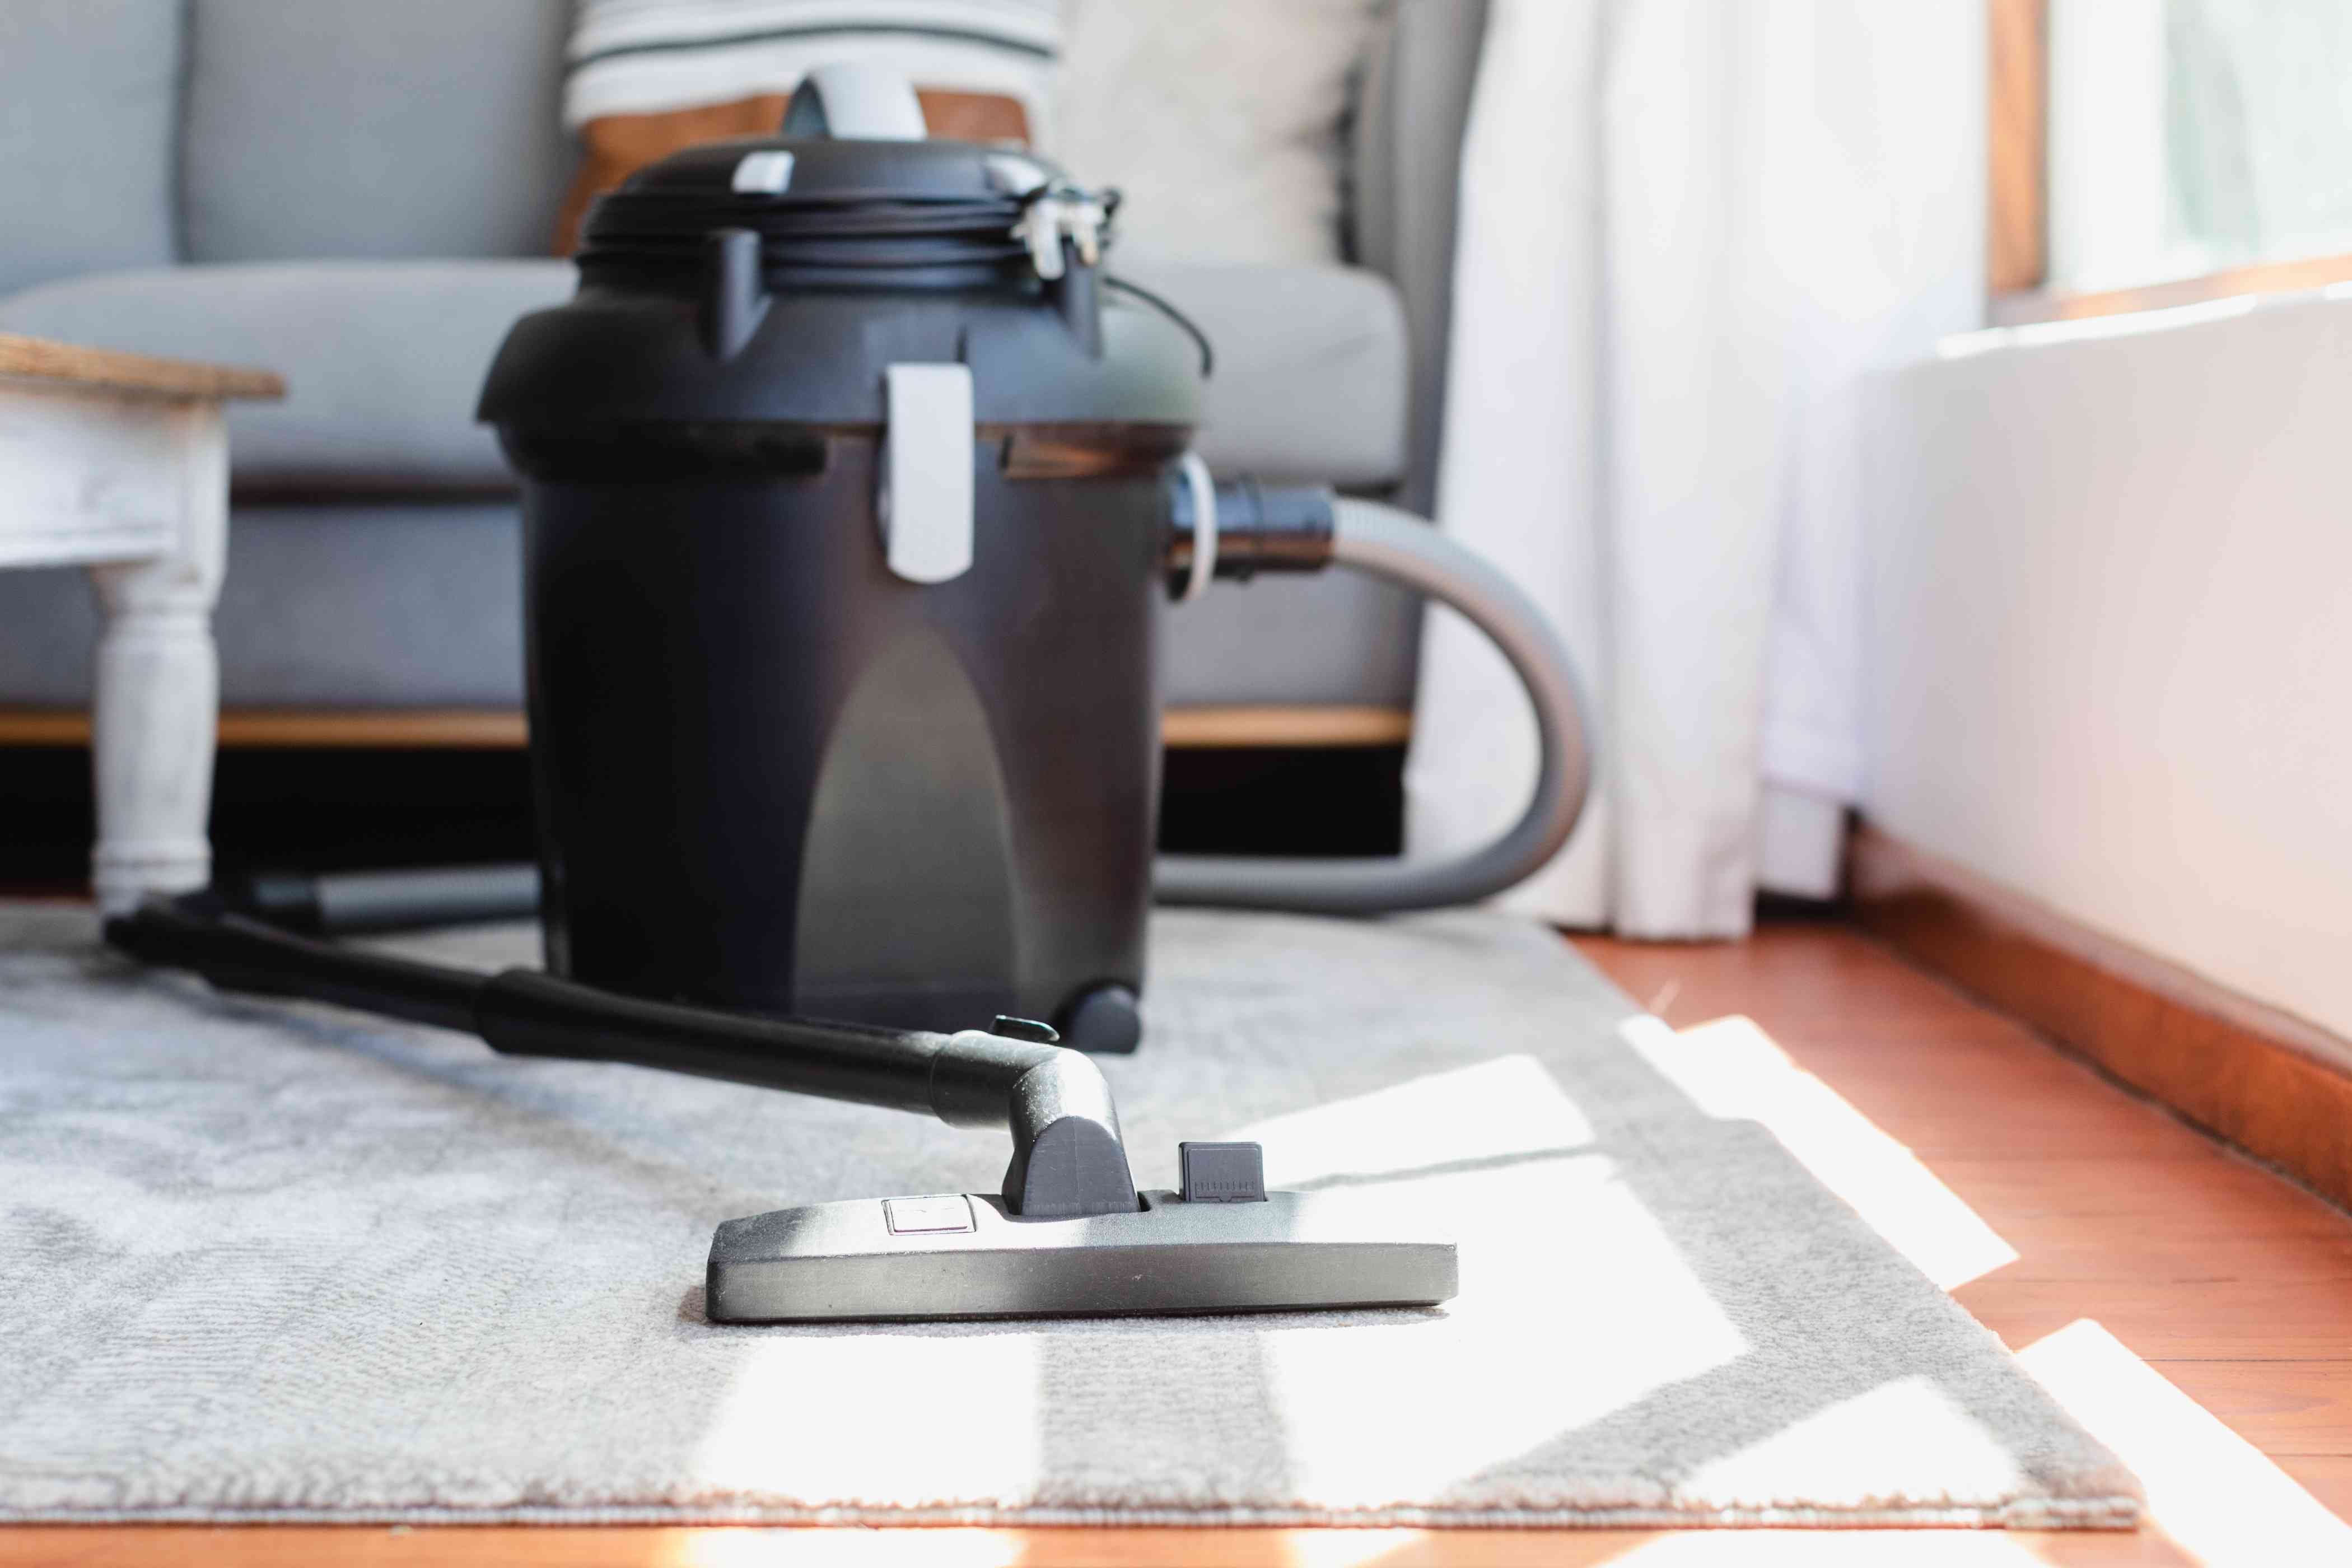 Upright vacuum cleaner resting on carpet